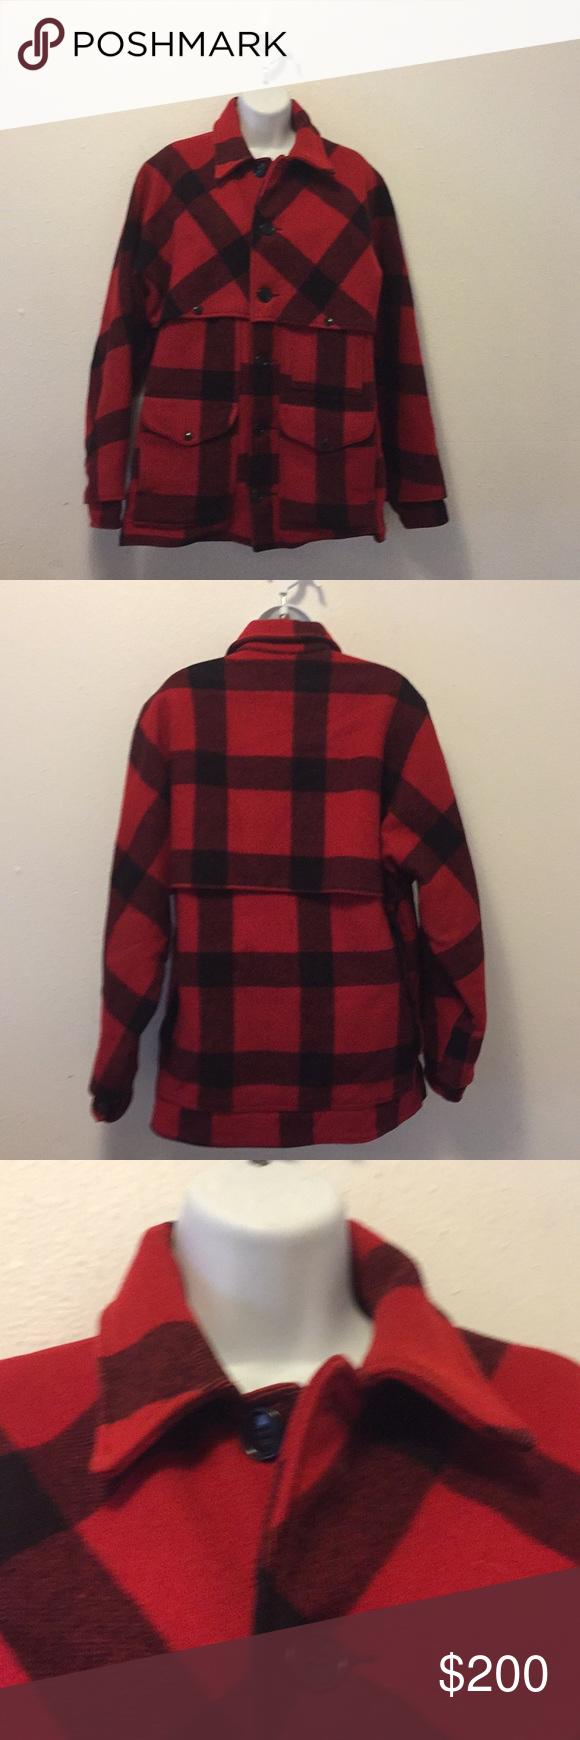 094a6cec2 Filson Vintage wool jacket Filson Vintage wool jacket in excellent ...